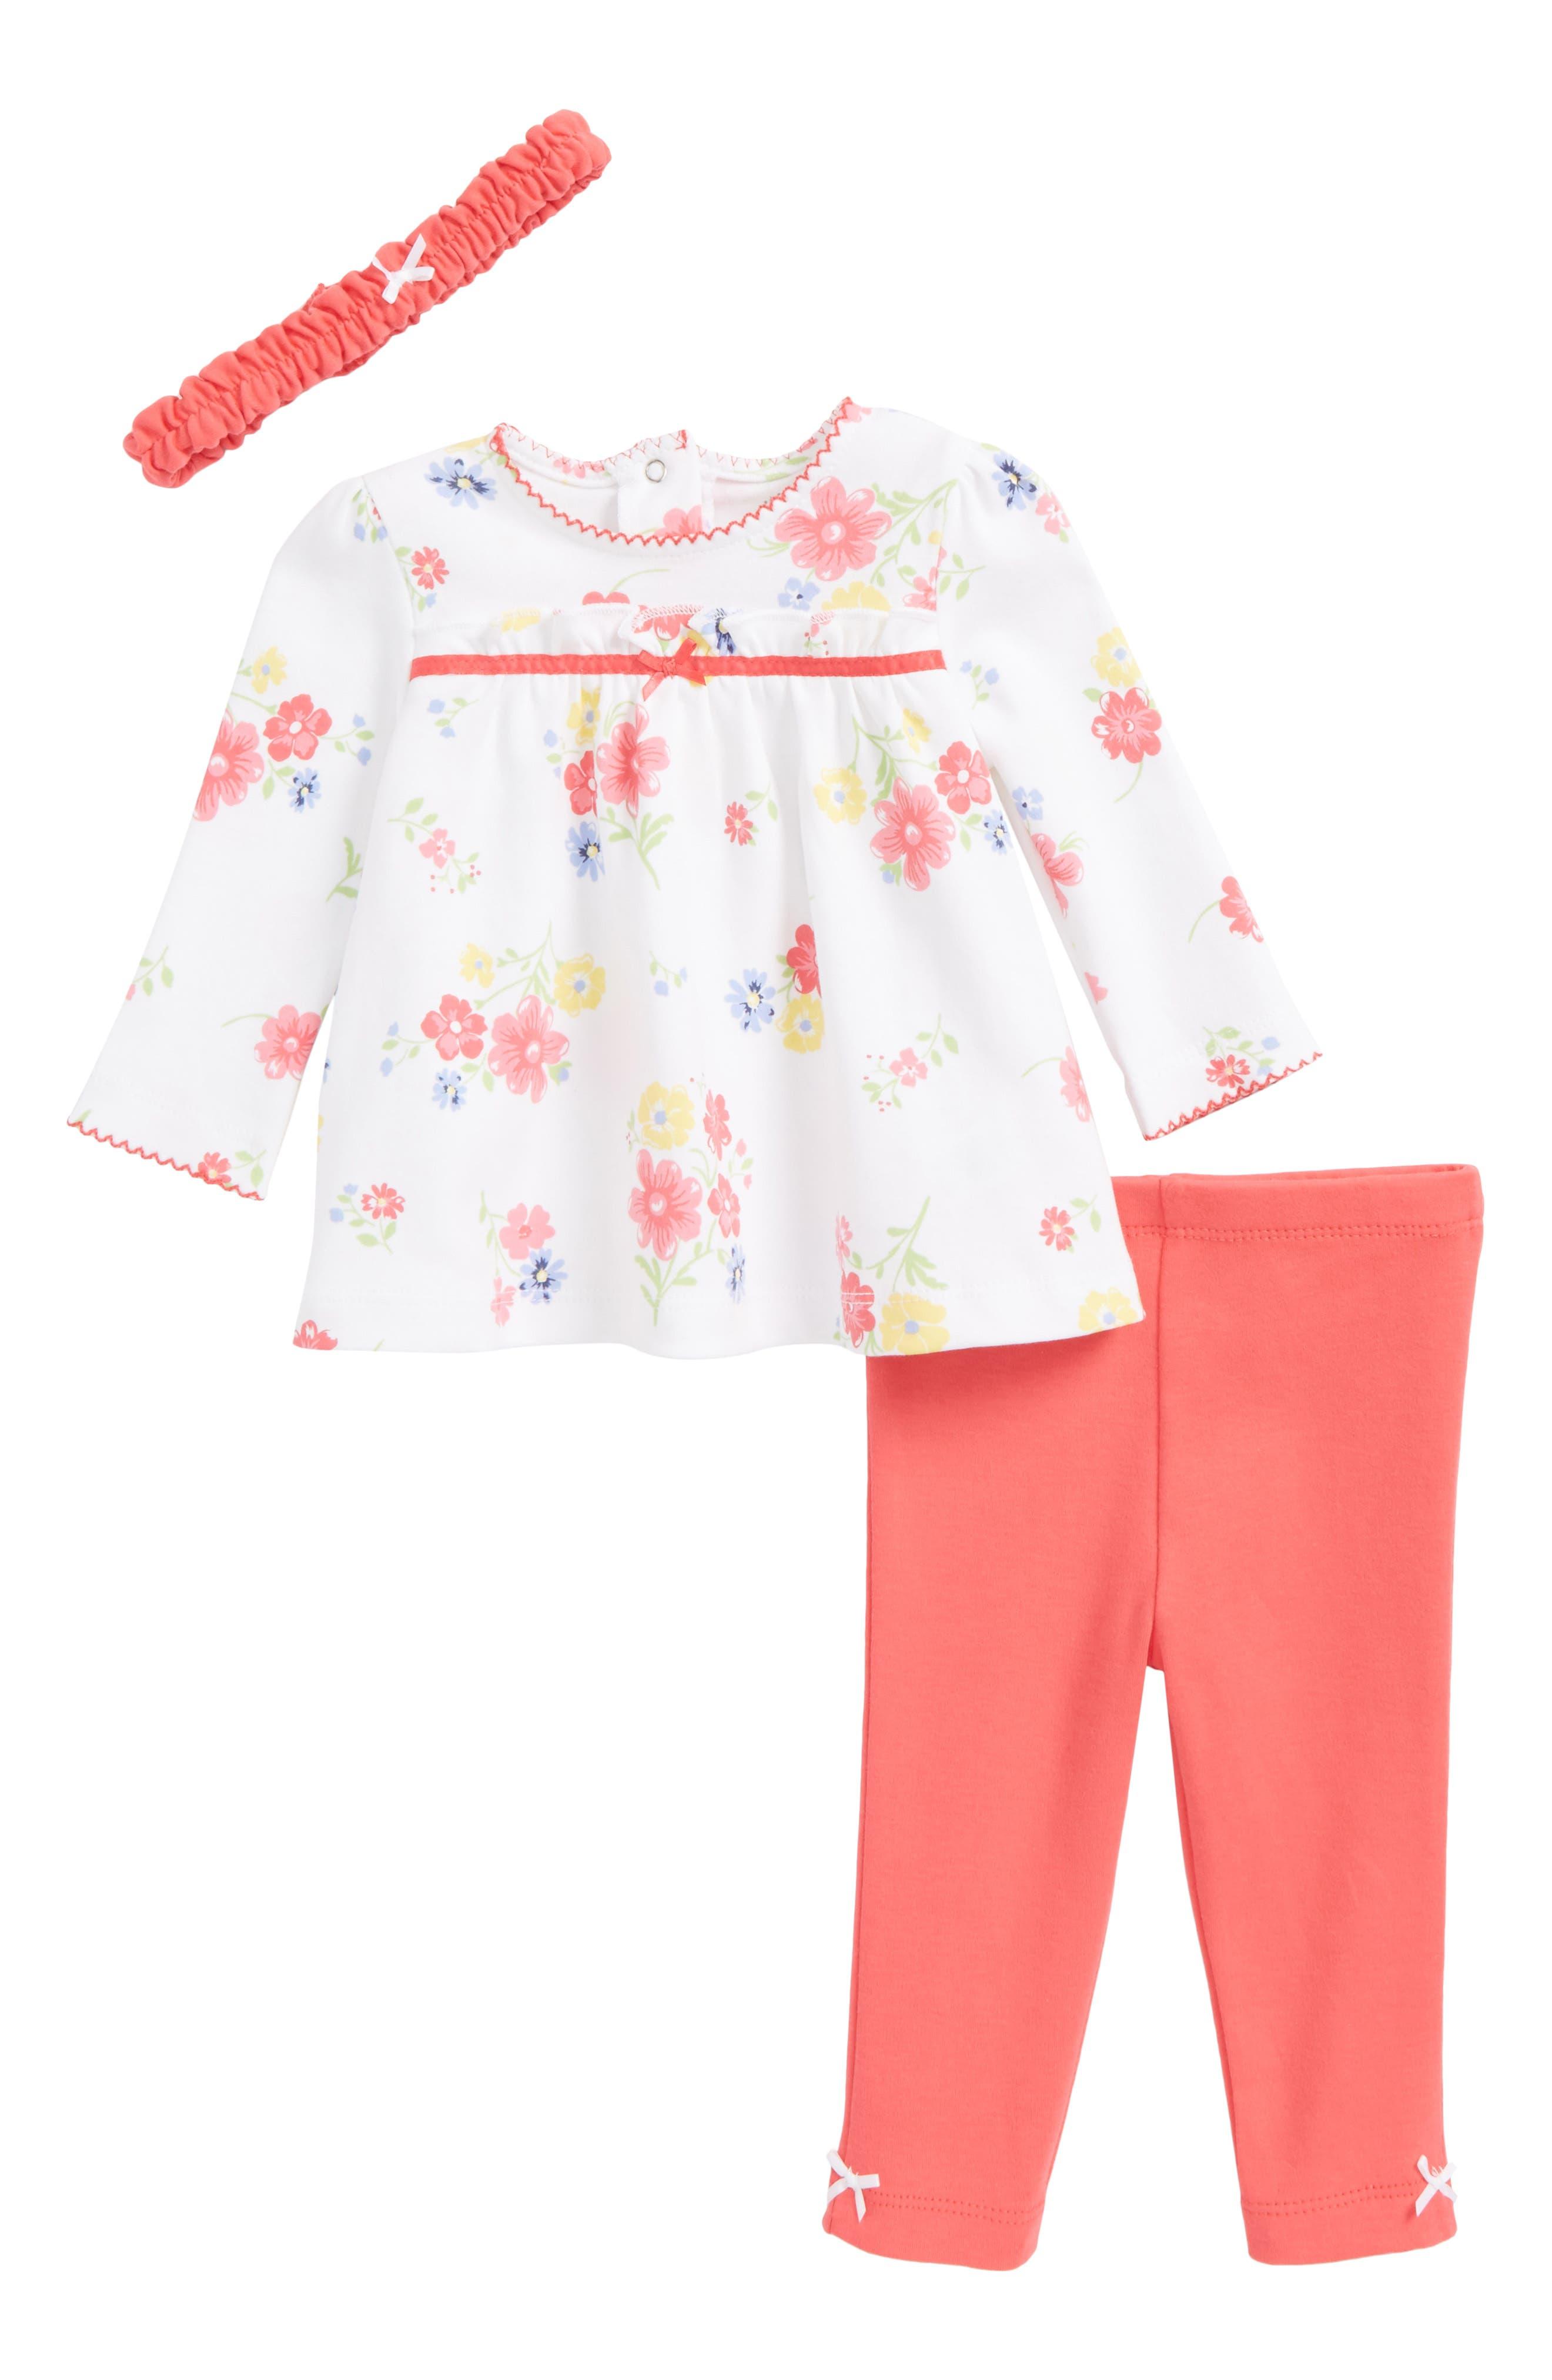 Fun Flower Tunic, Leggings & Headband Set,                         Main,                         color, Red Print